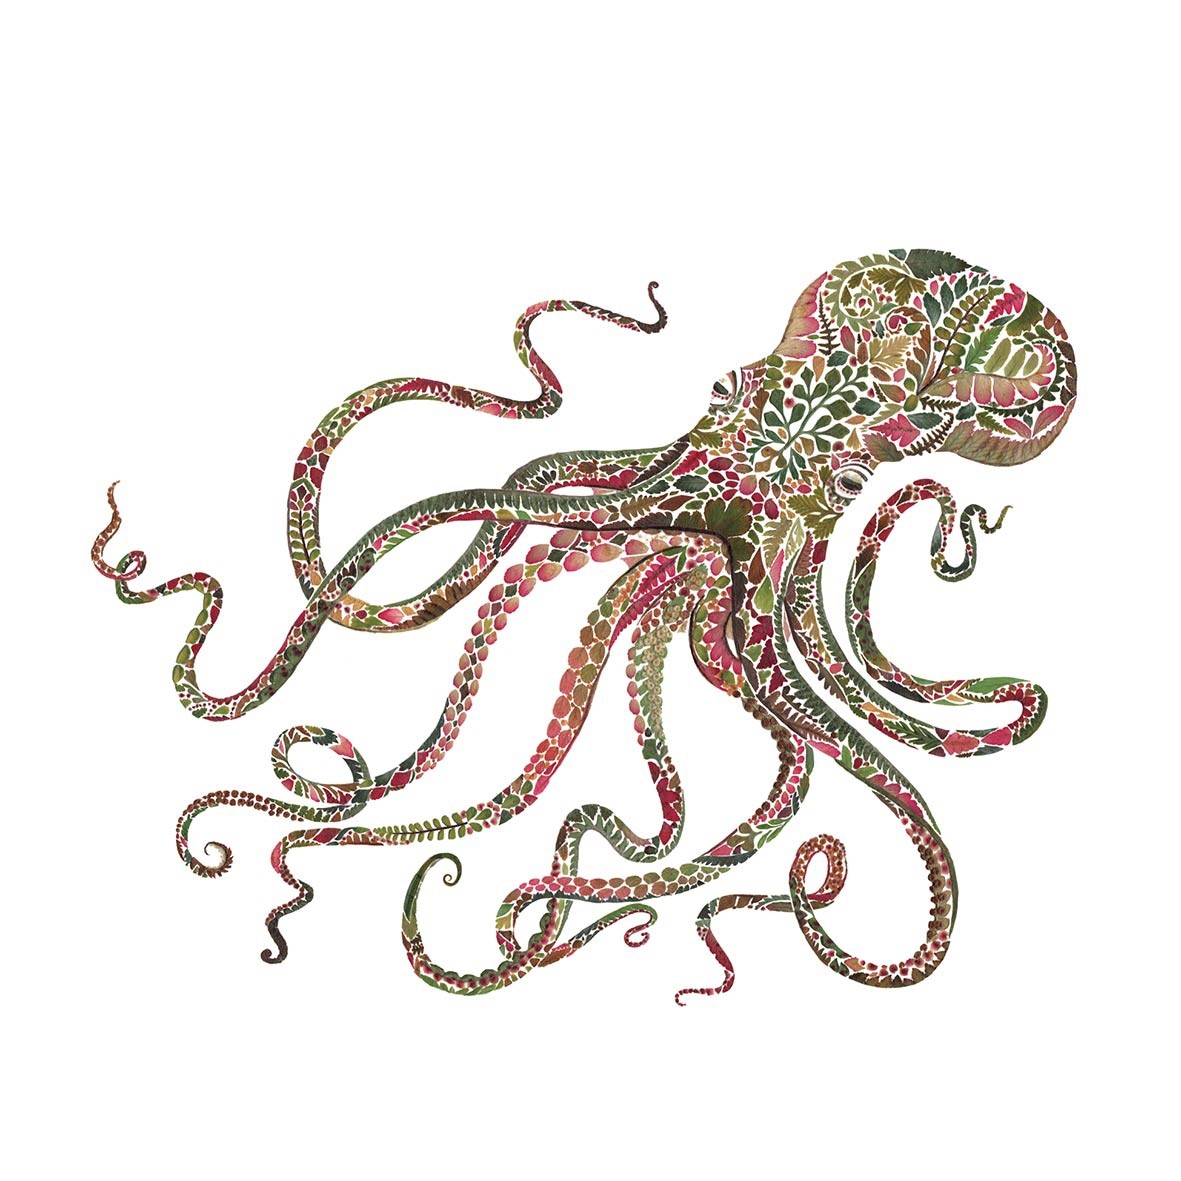 Serwetki 25x25 cm - Green Octopus 25x25 cm